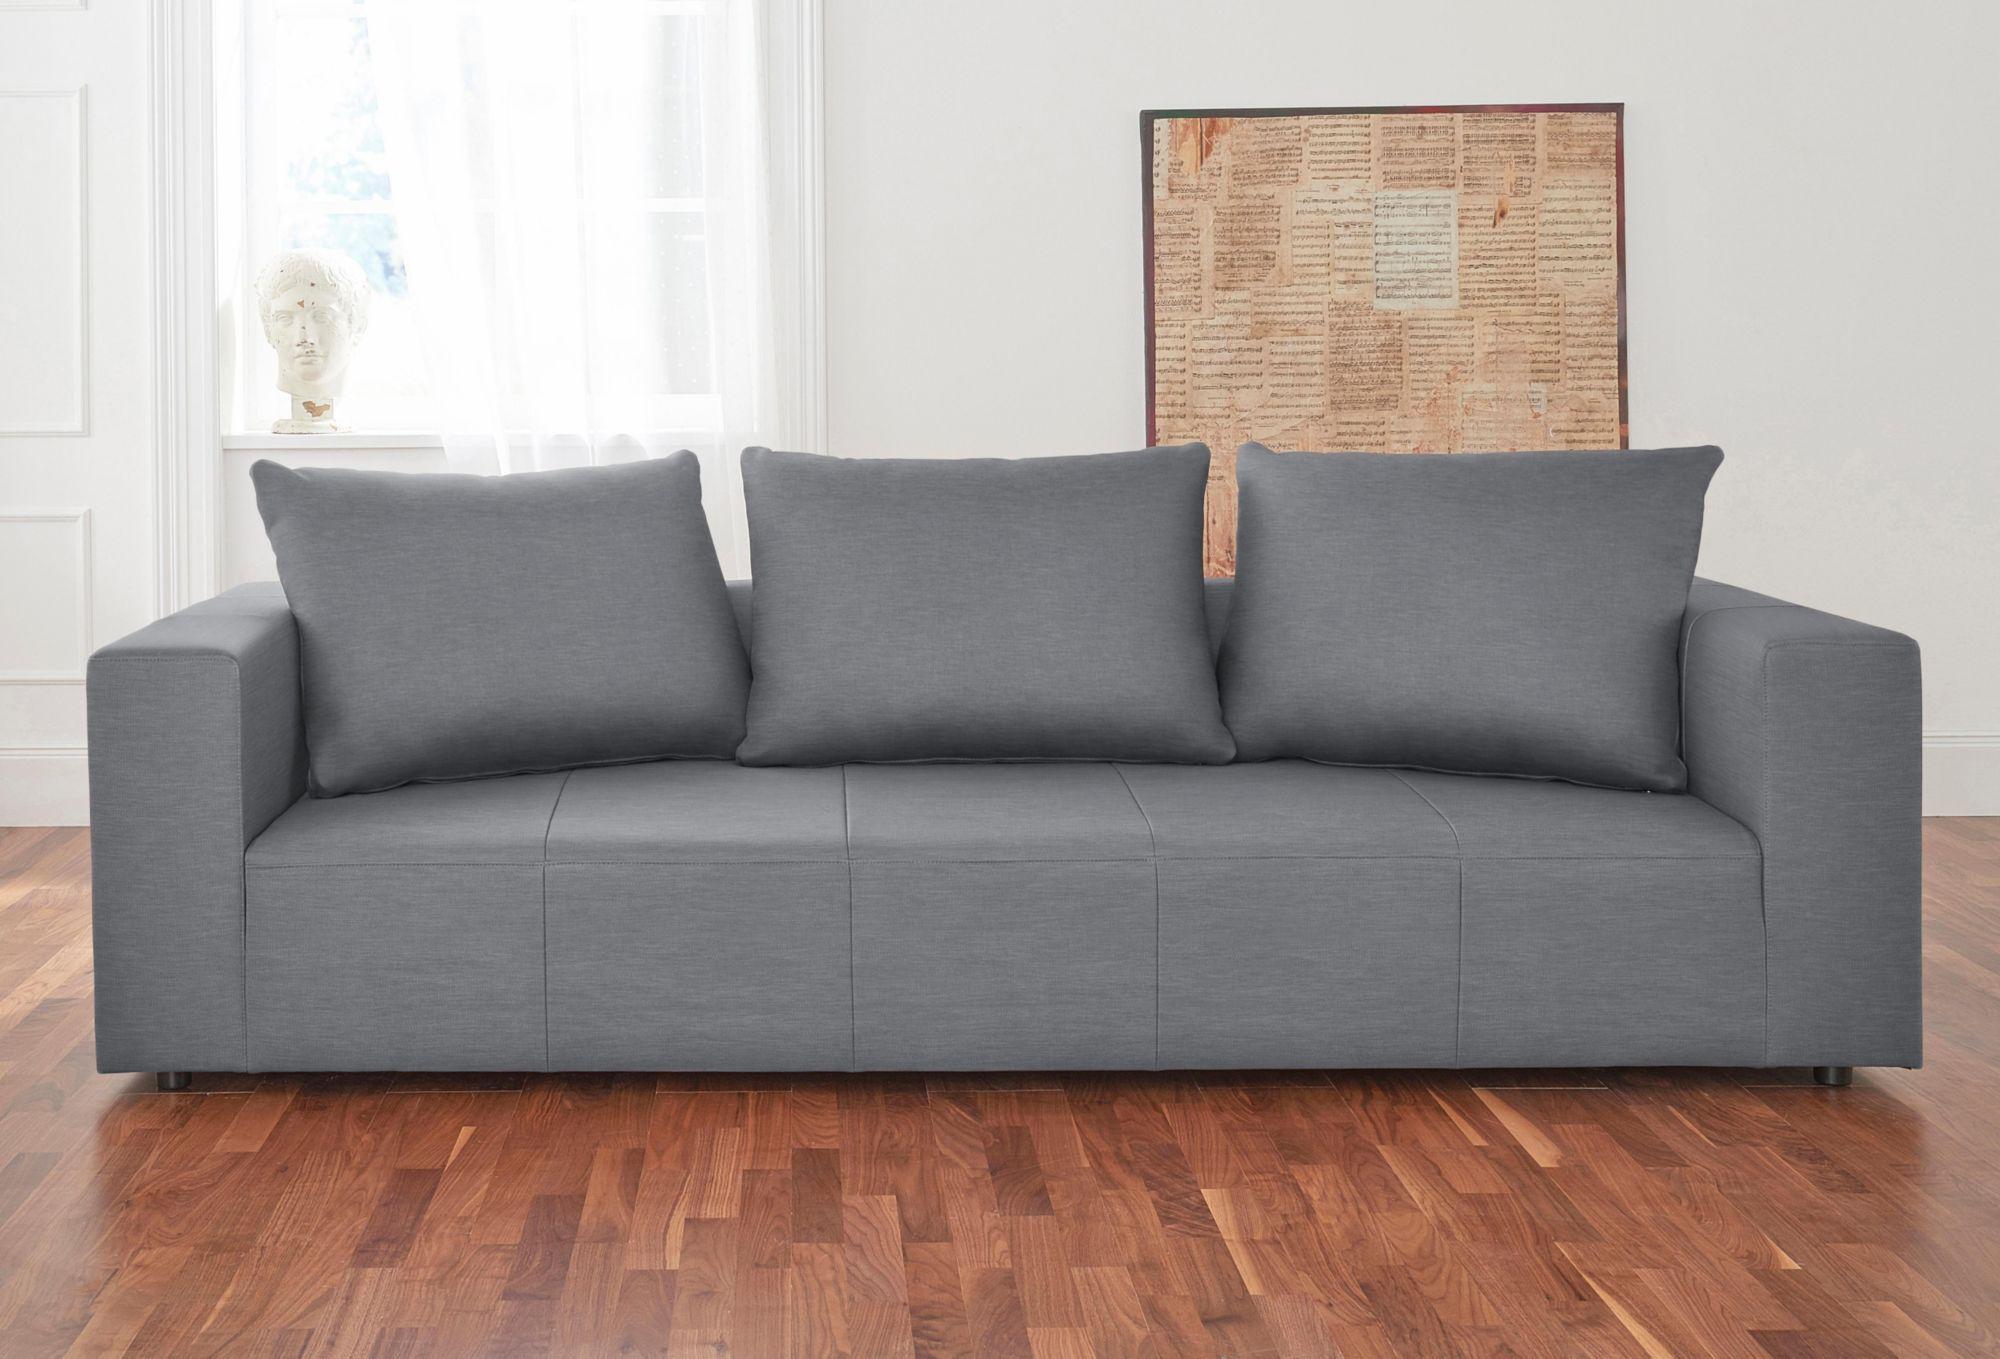 ALTE GERBEREI Alte Gerberei 3-Sitzer Sofa »Konstantin«, inklusive Rückenkissen